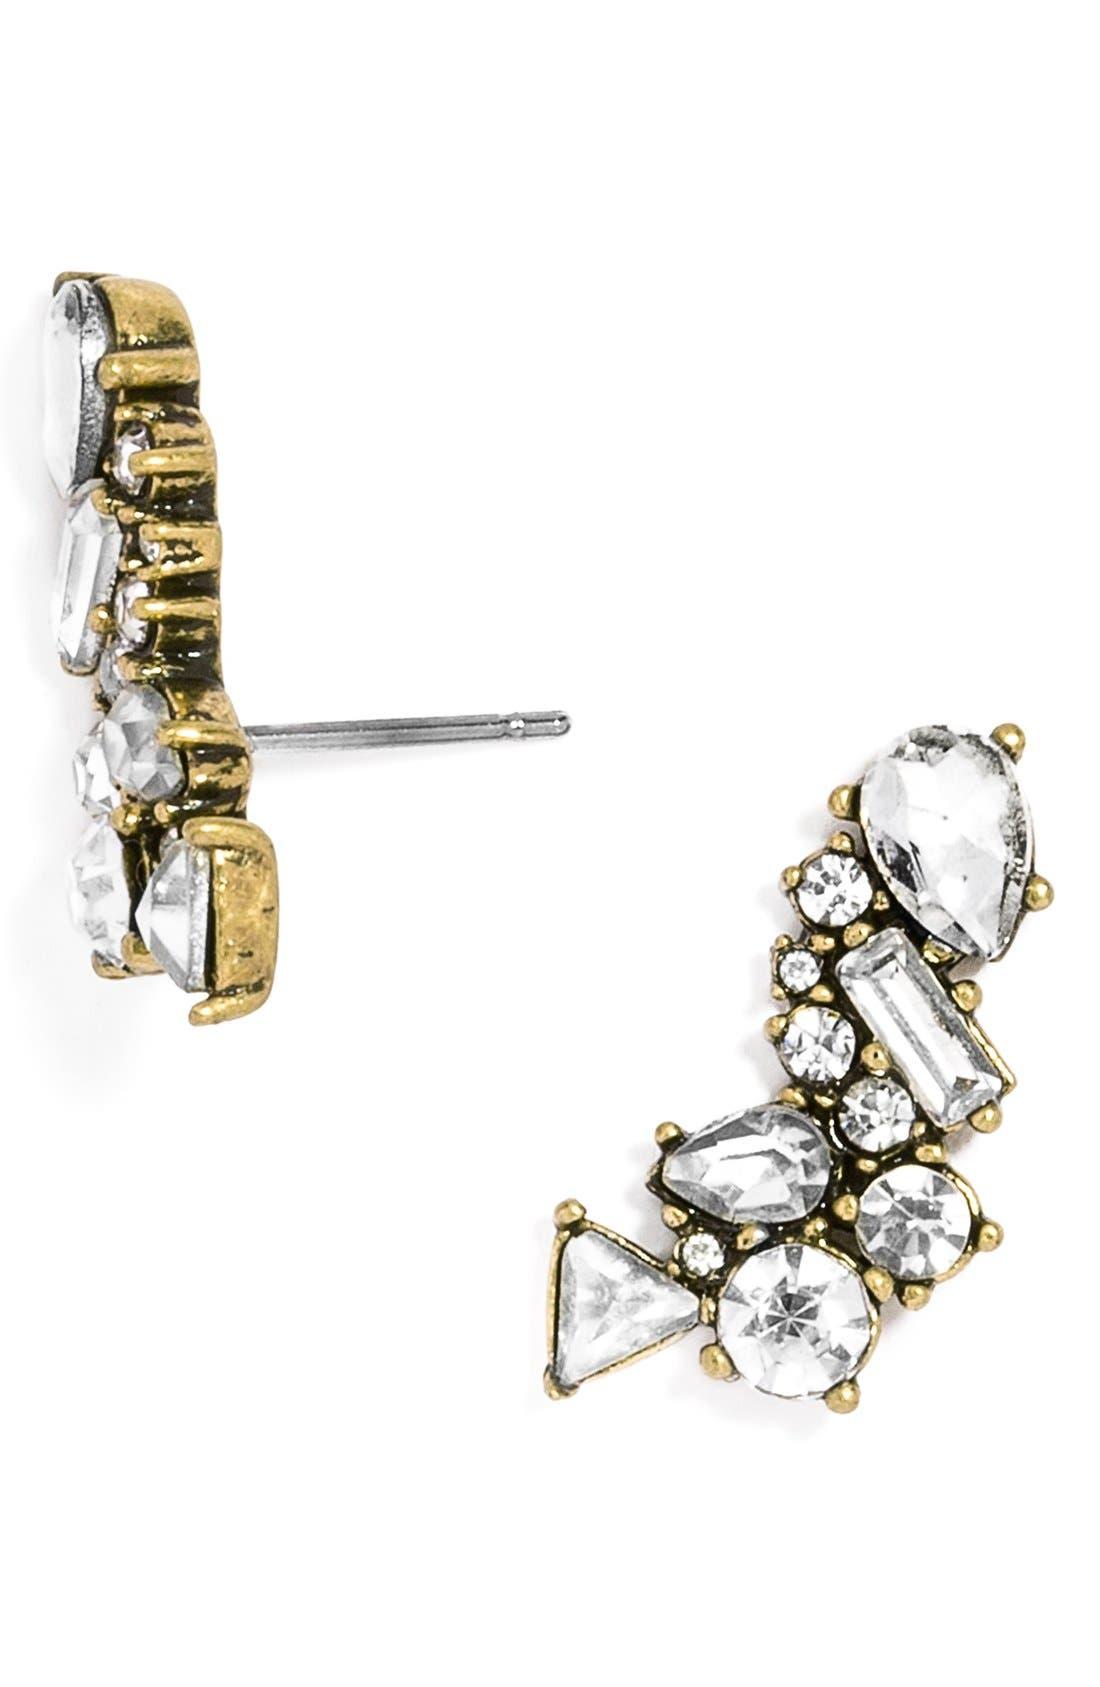 Main Image - BaubleBar Crystal Triangle Ear Crawlers